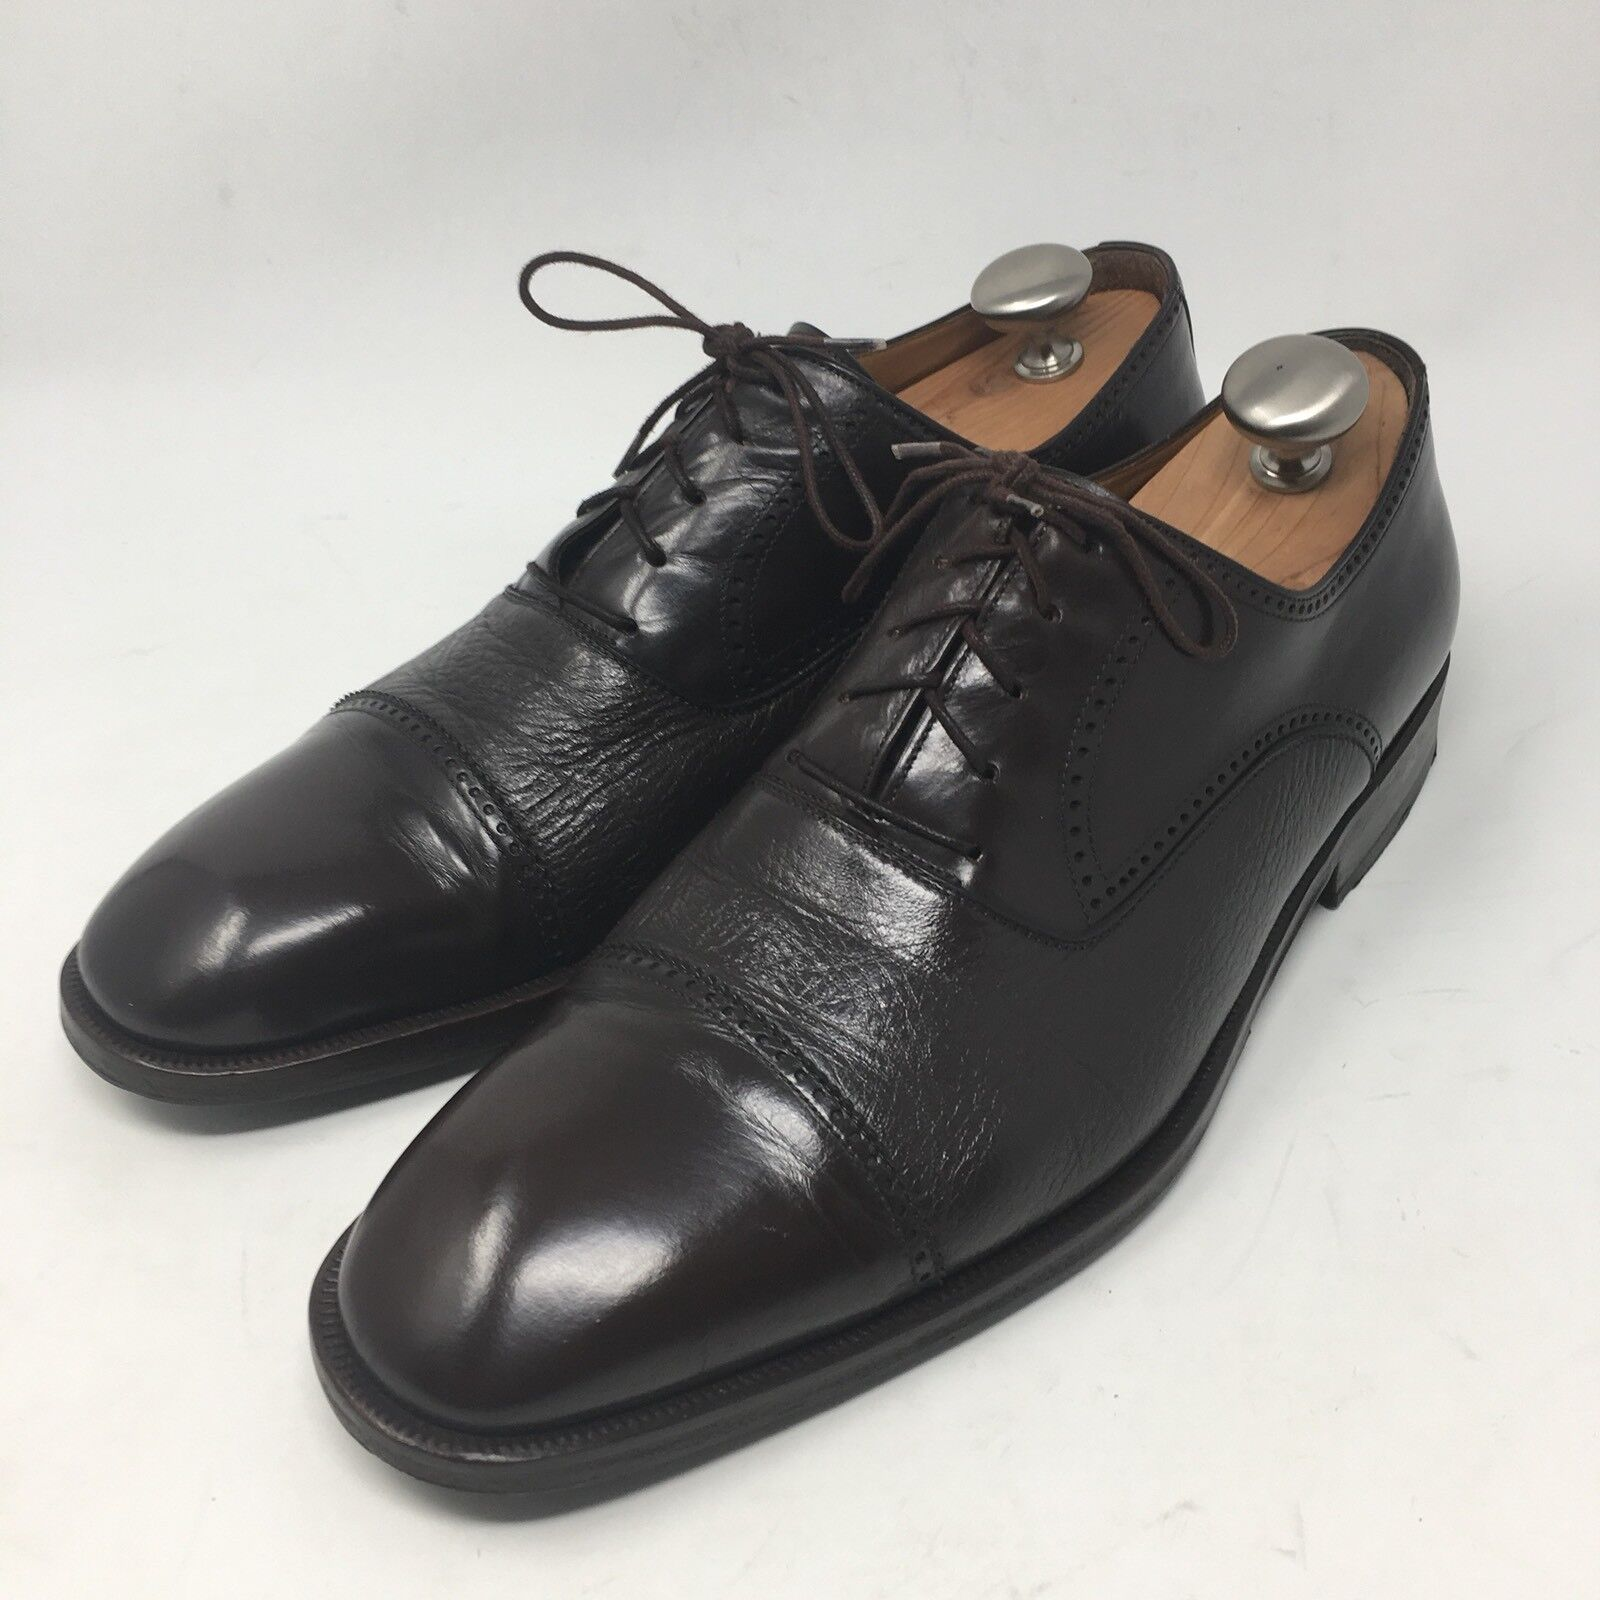 Magnanni  Brown Leather Mens Oxford Cap Toe Dress shoes Size 10.5 M Spain